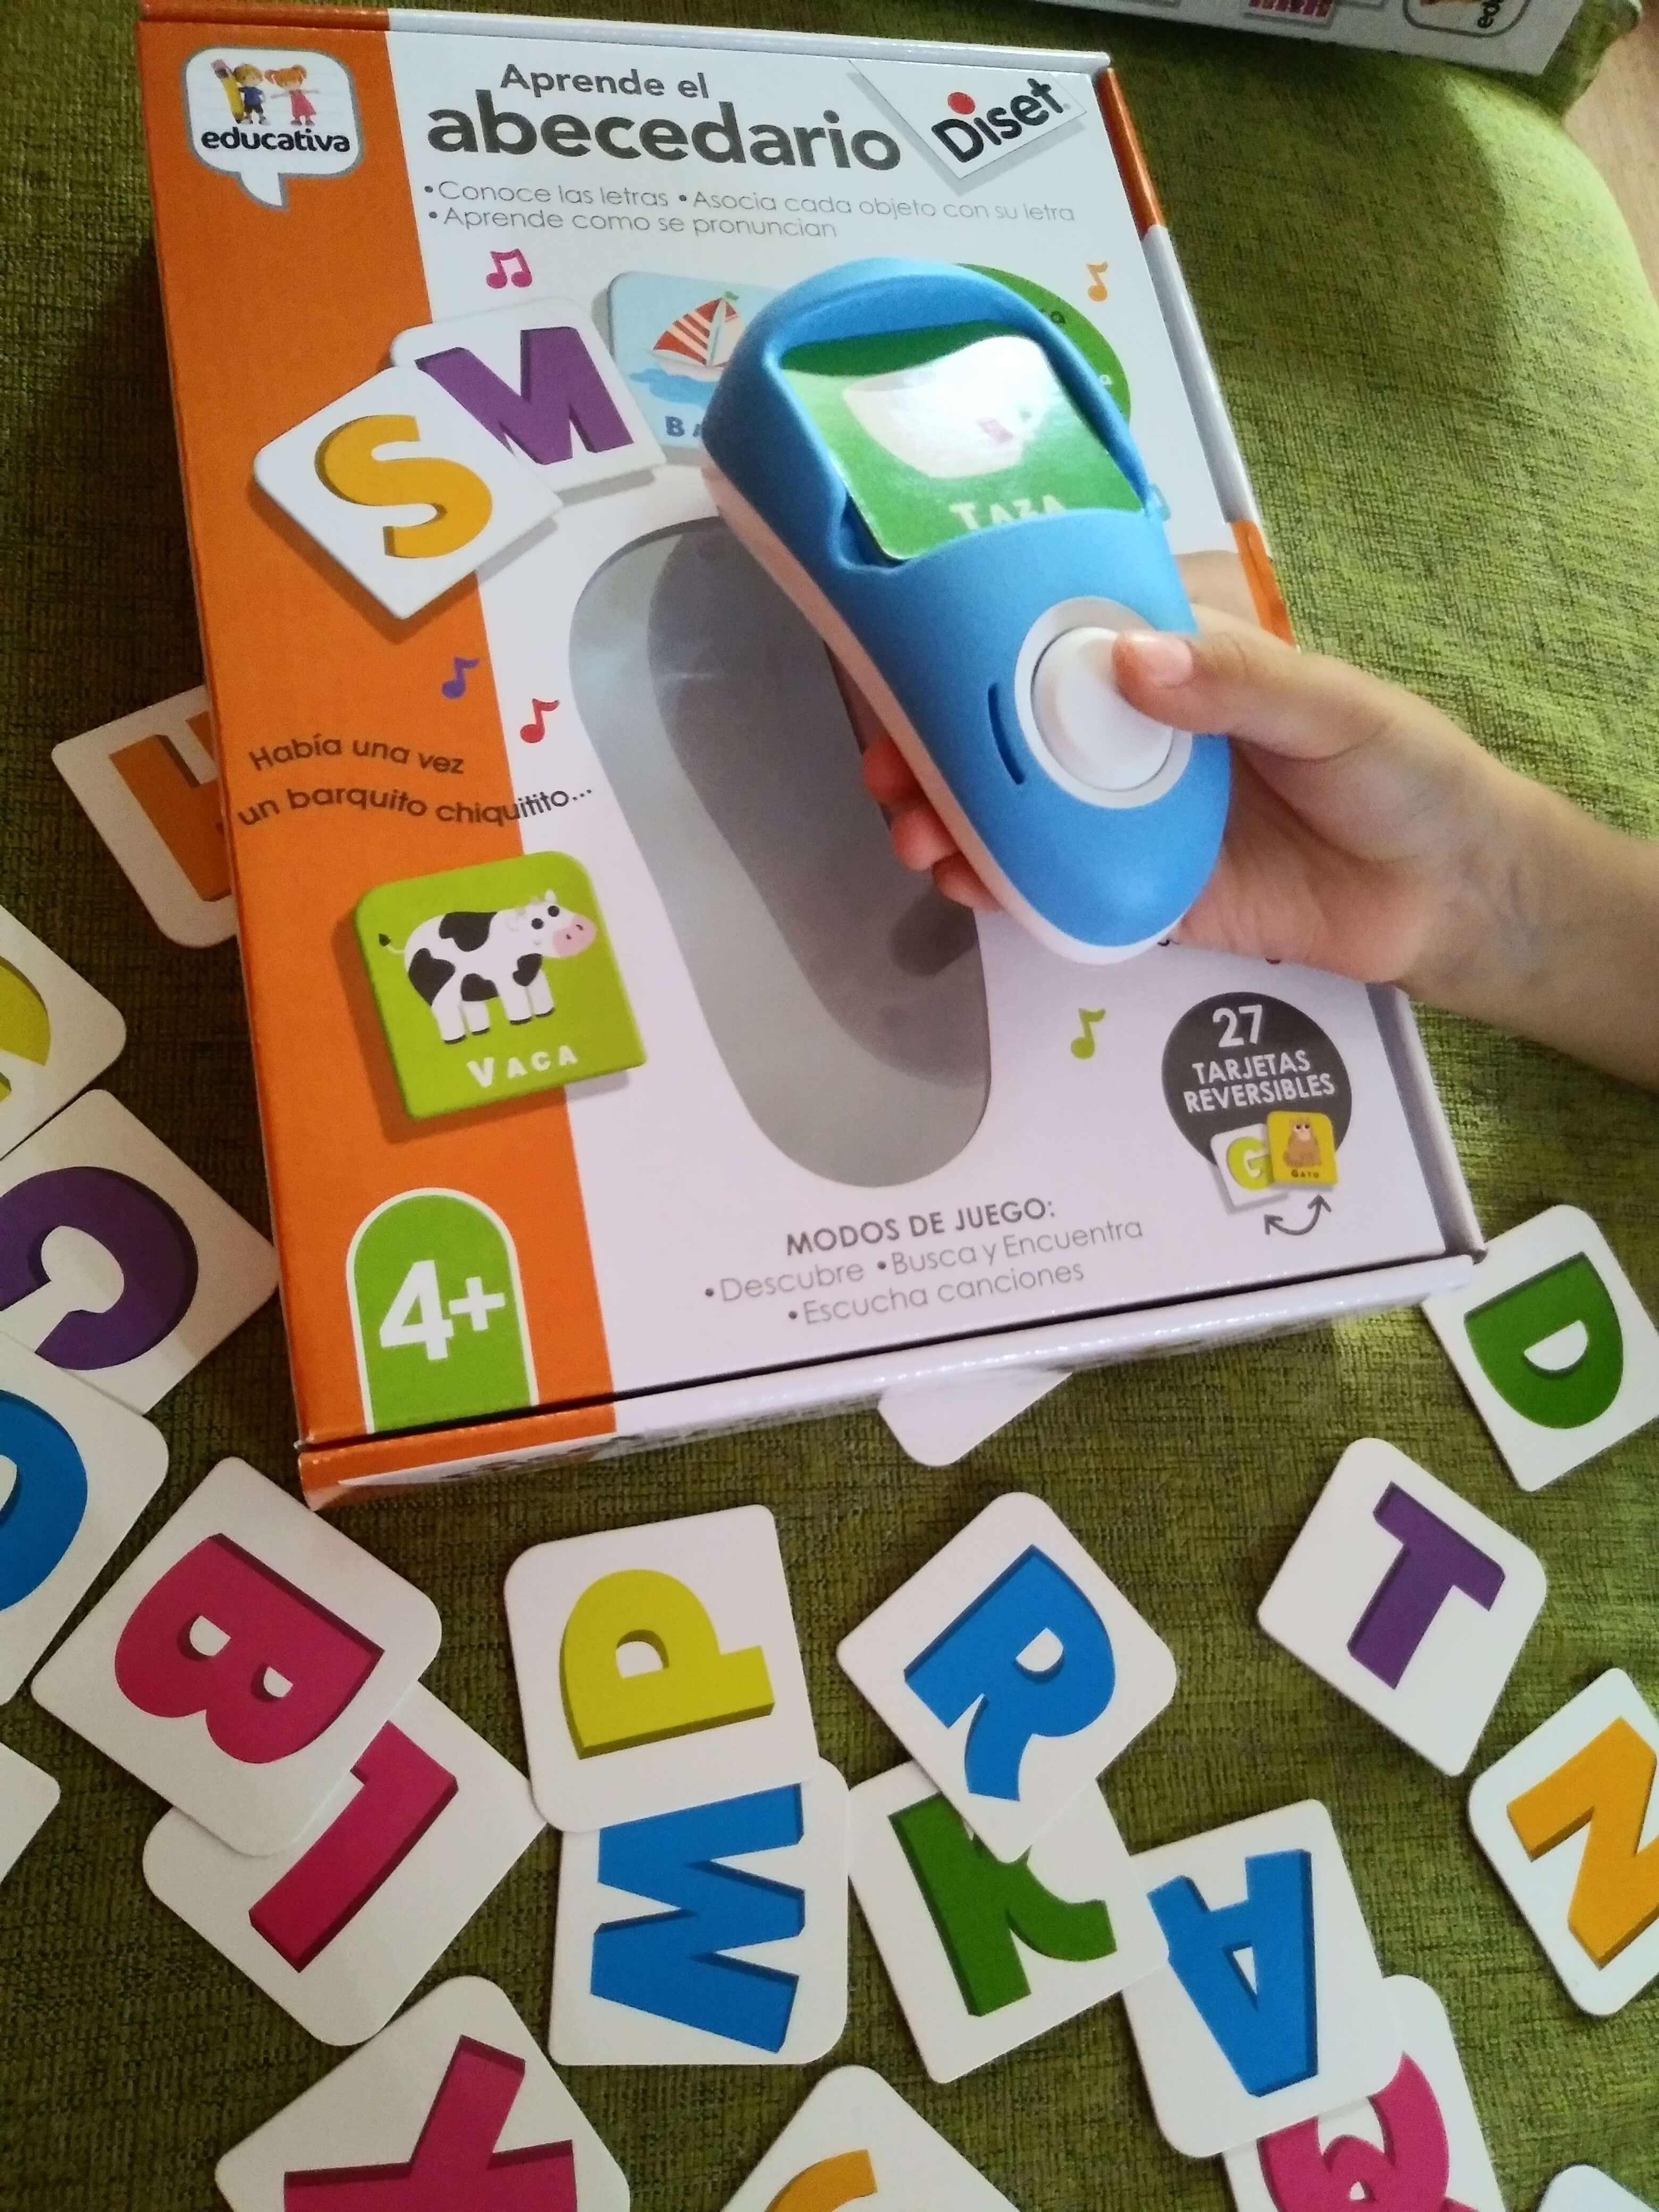 Juegos Educativos Para Ninos De 3 A 6 Anos Pequenique